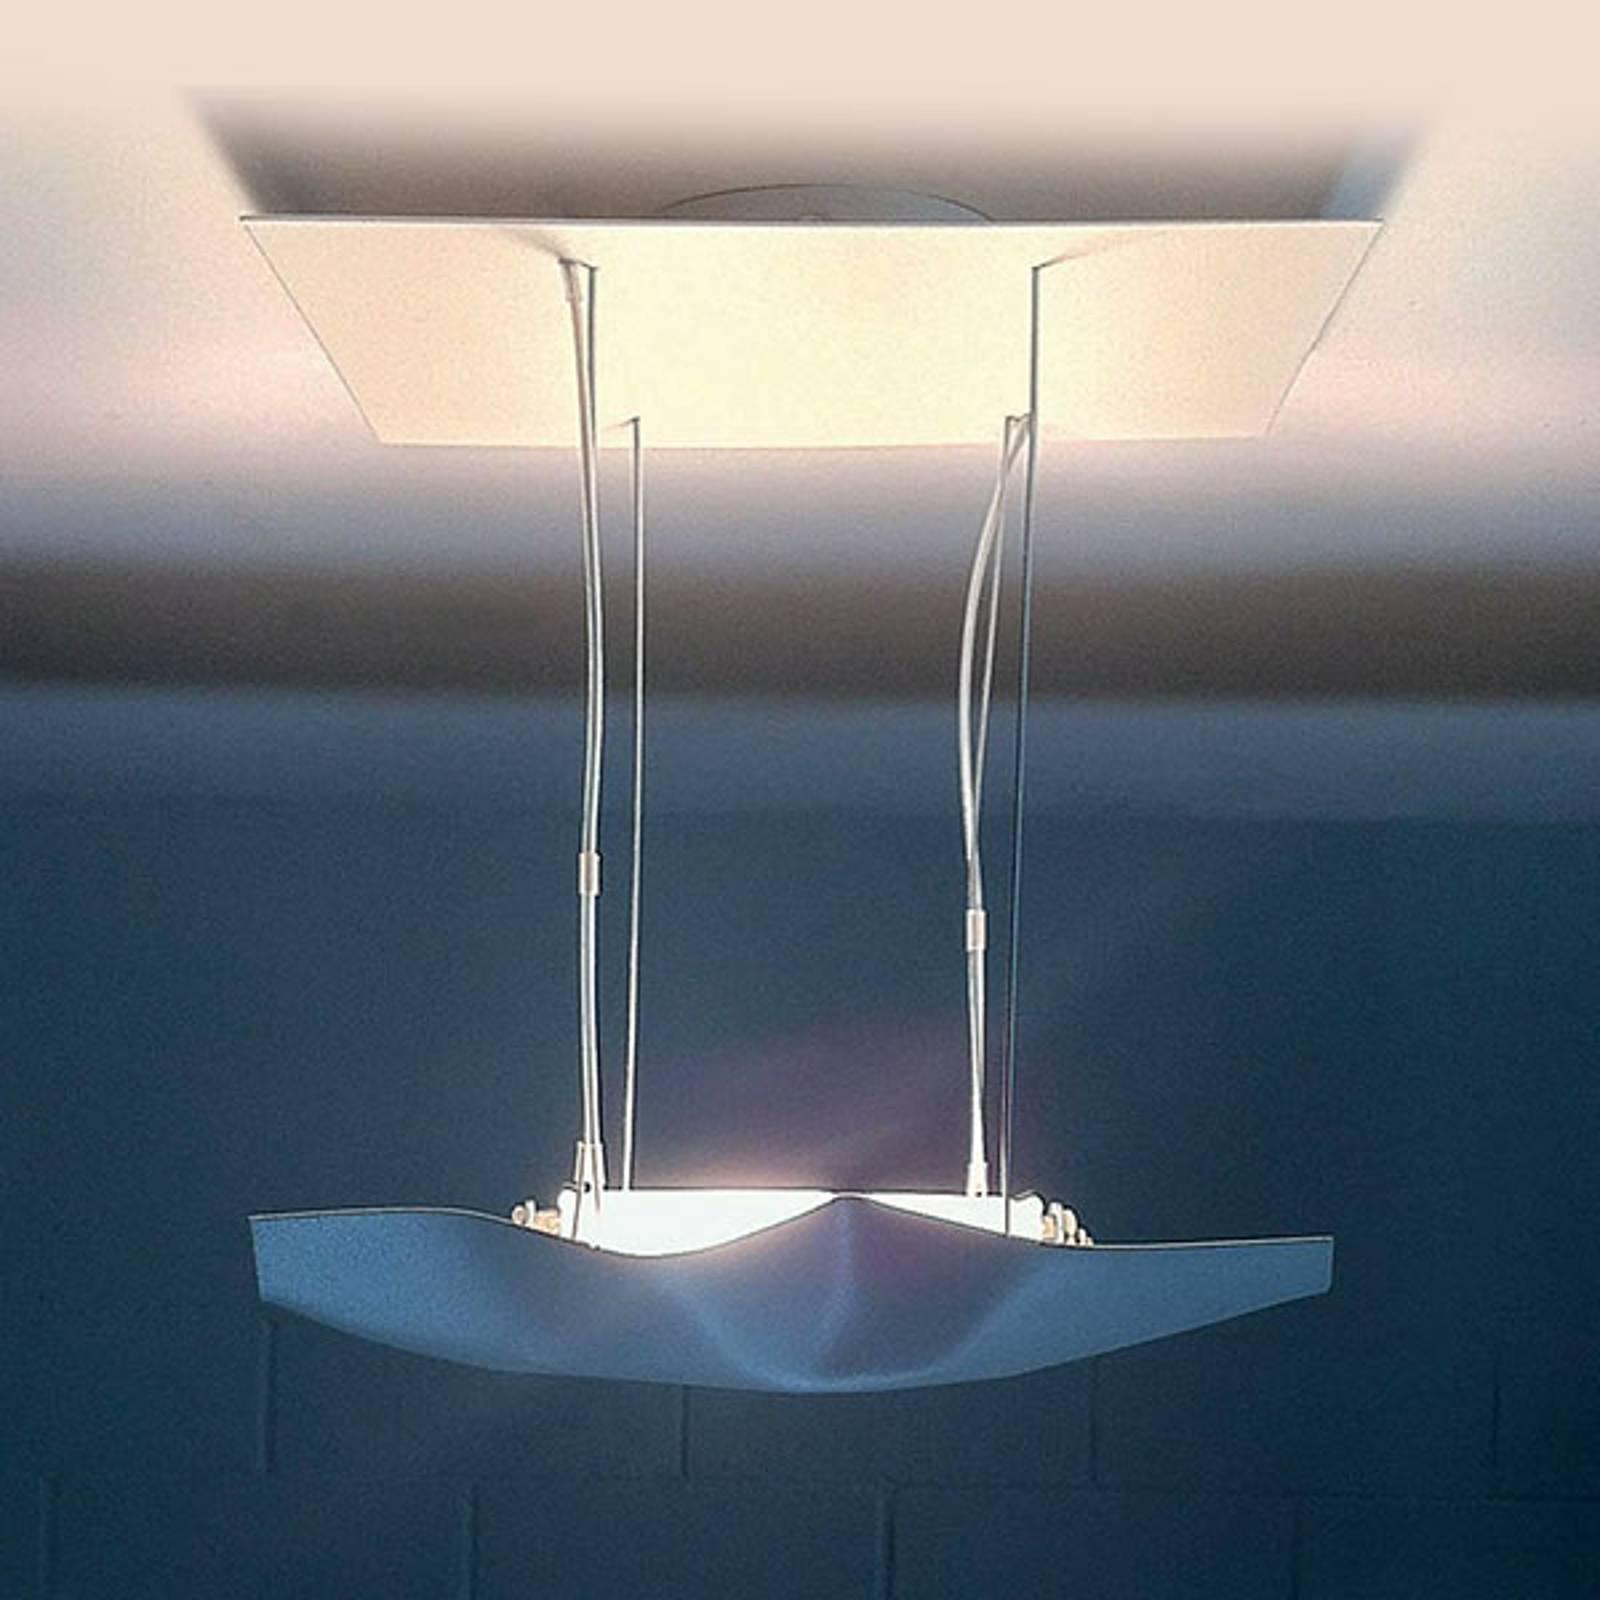 Knikerboker Piccola Crash LED plafondlamp wit